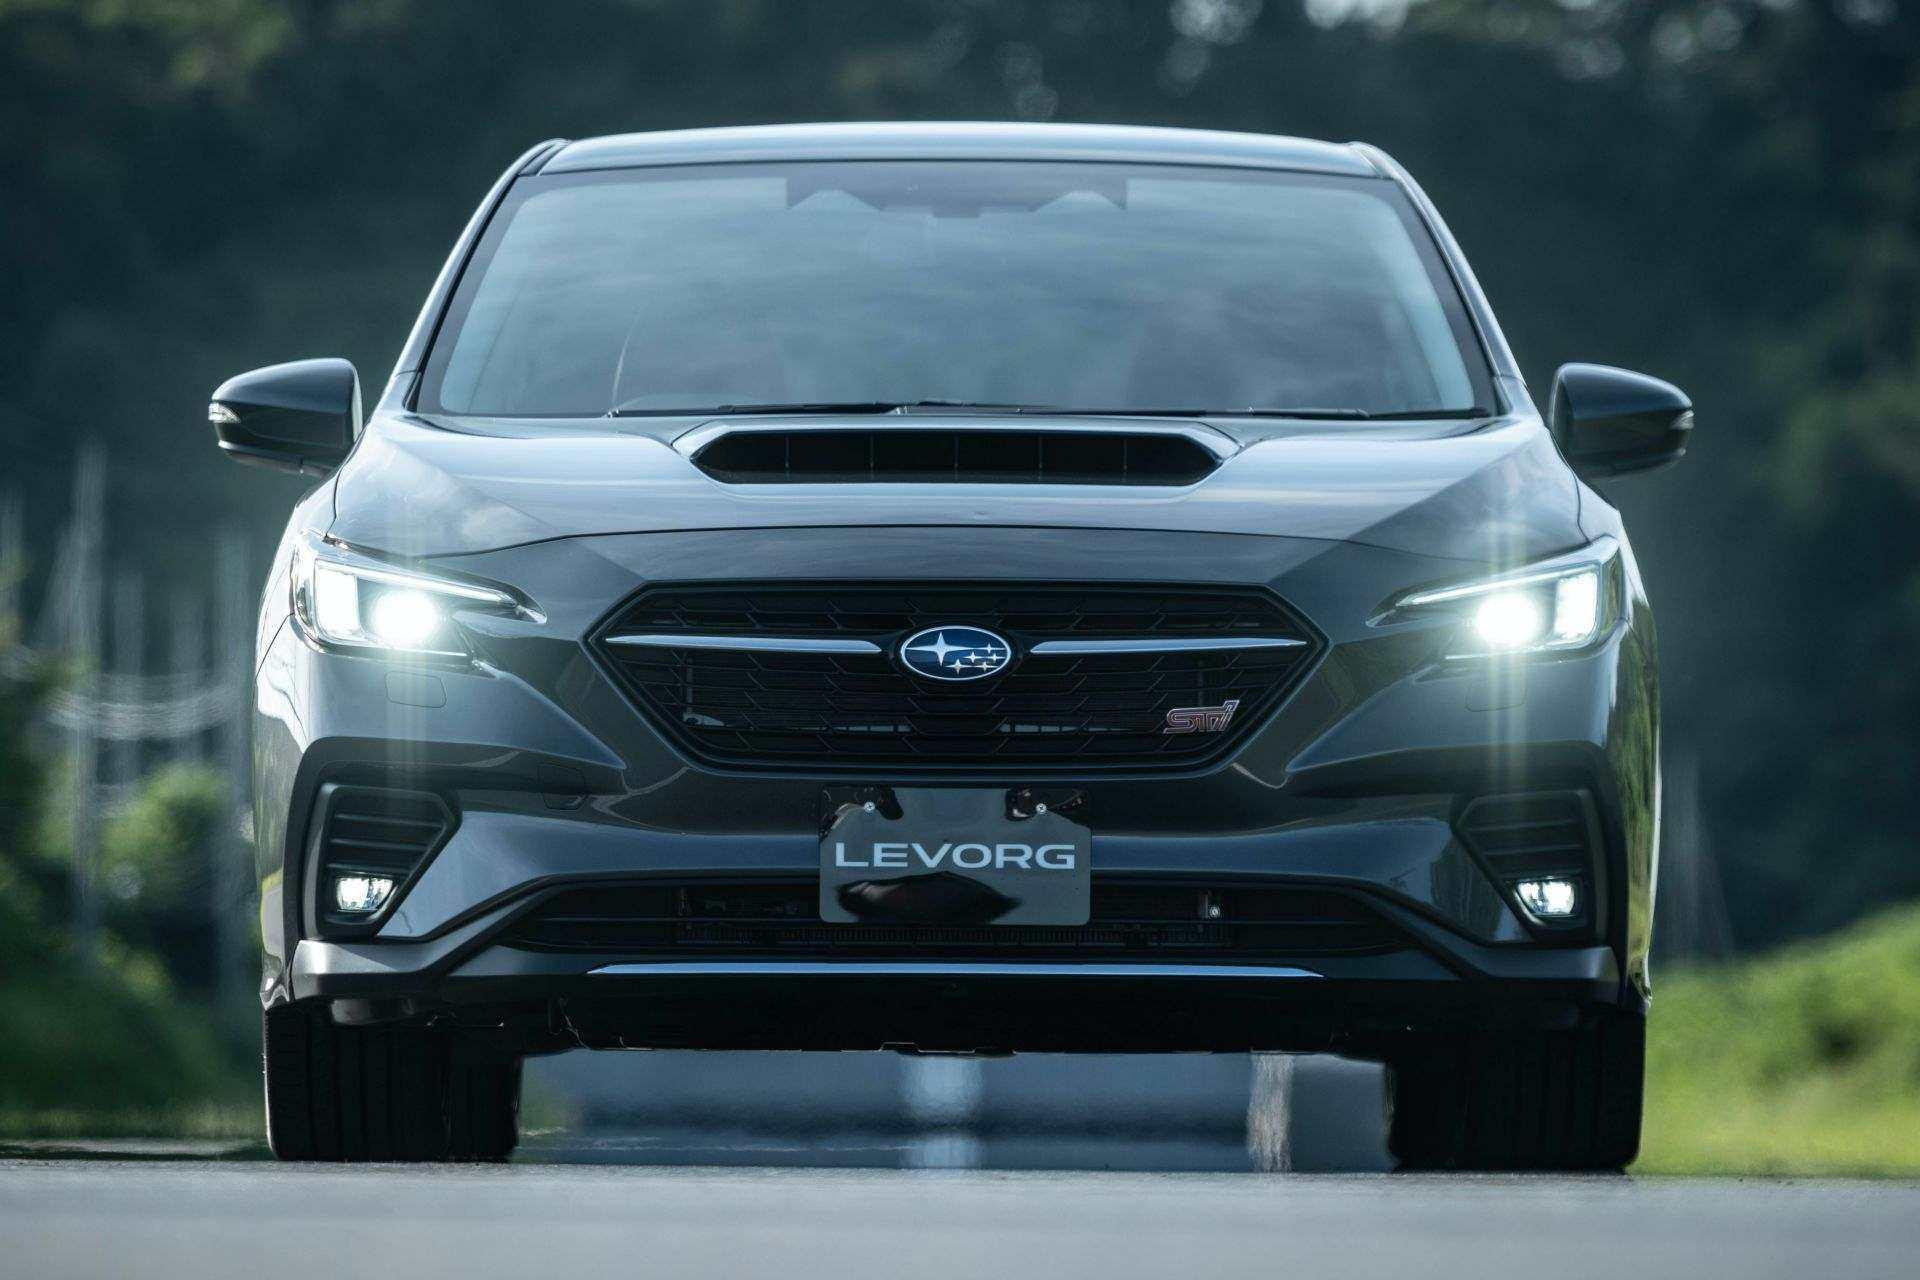 2021_Subaru_Levorg_0147